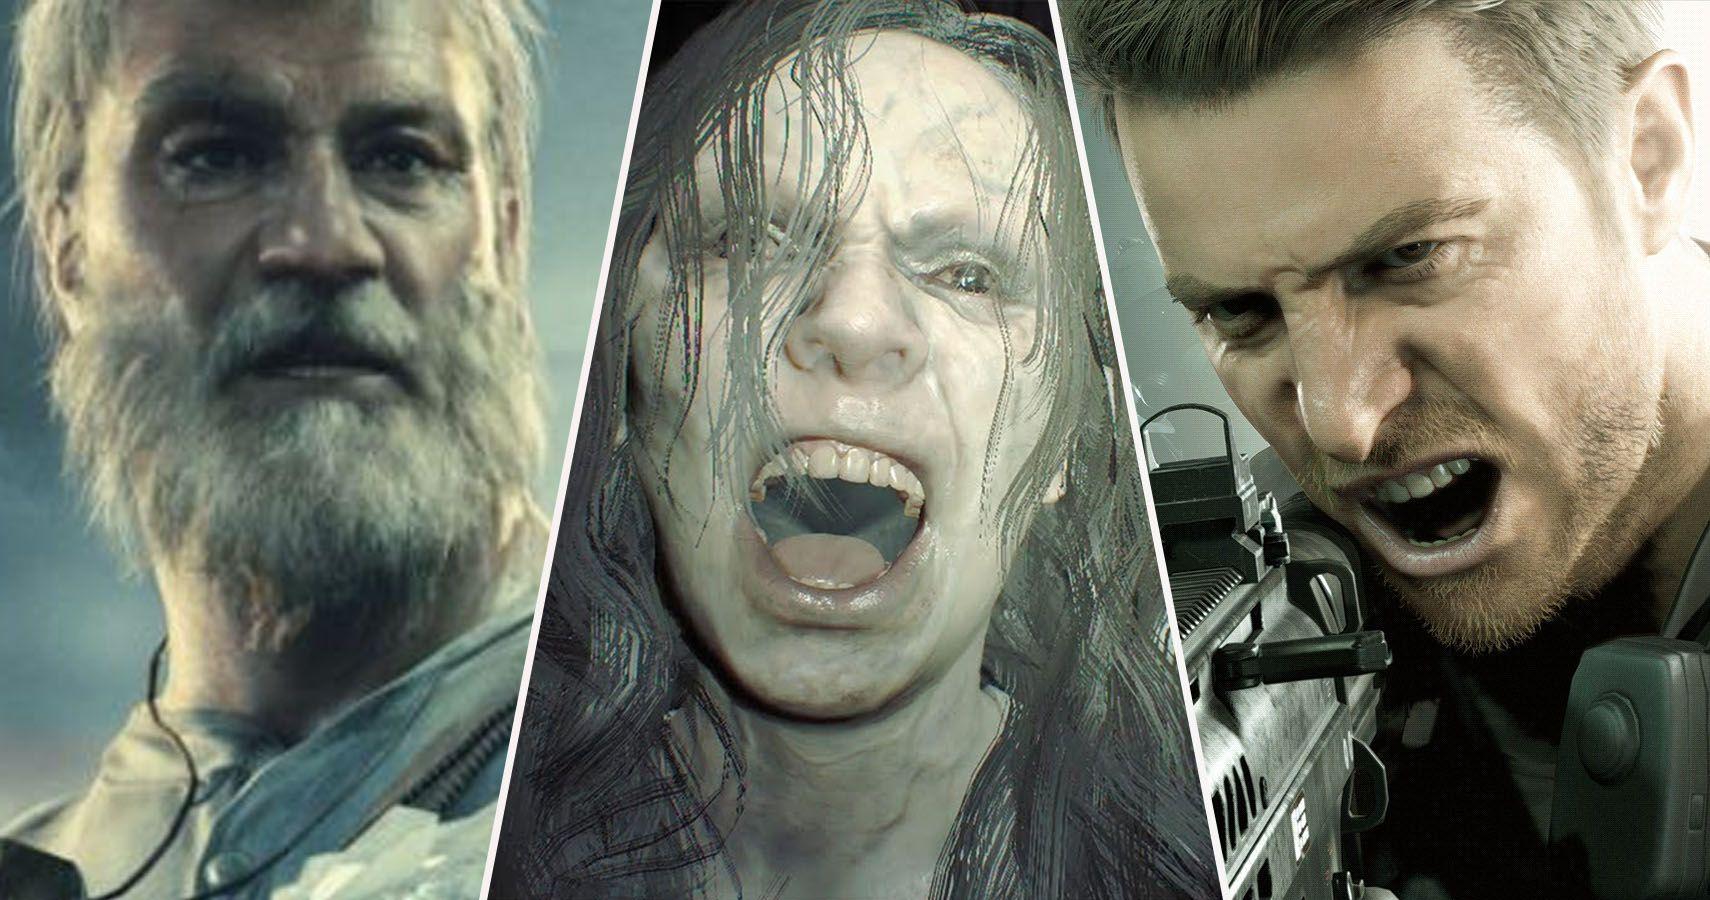 ¿Cuánto tiempo se tarda en vencer a Resident Evil 7?